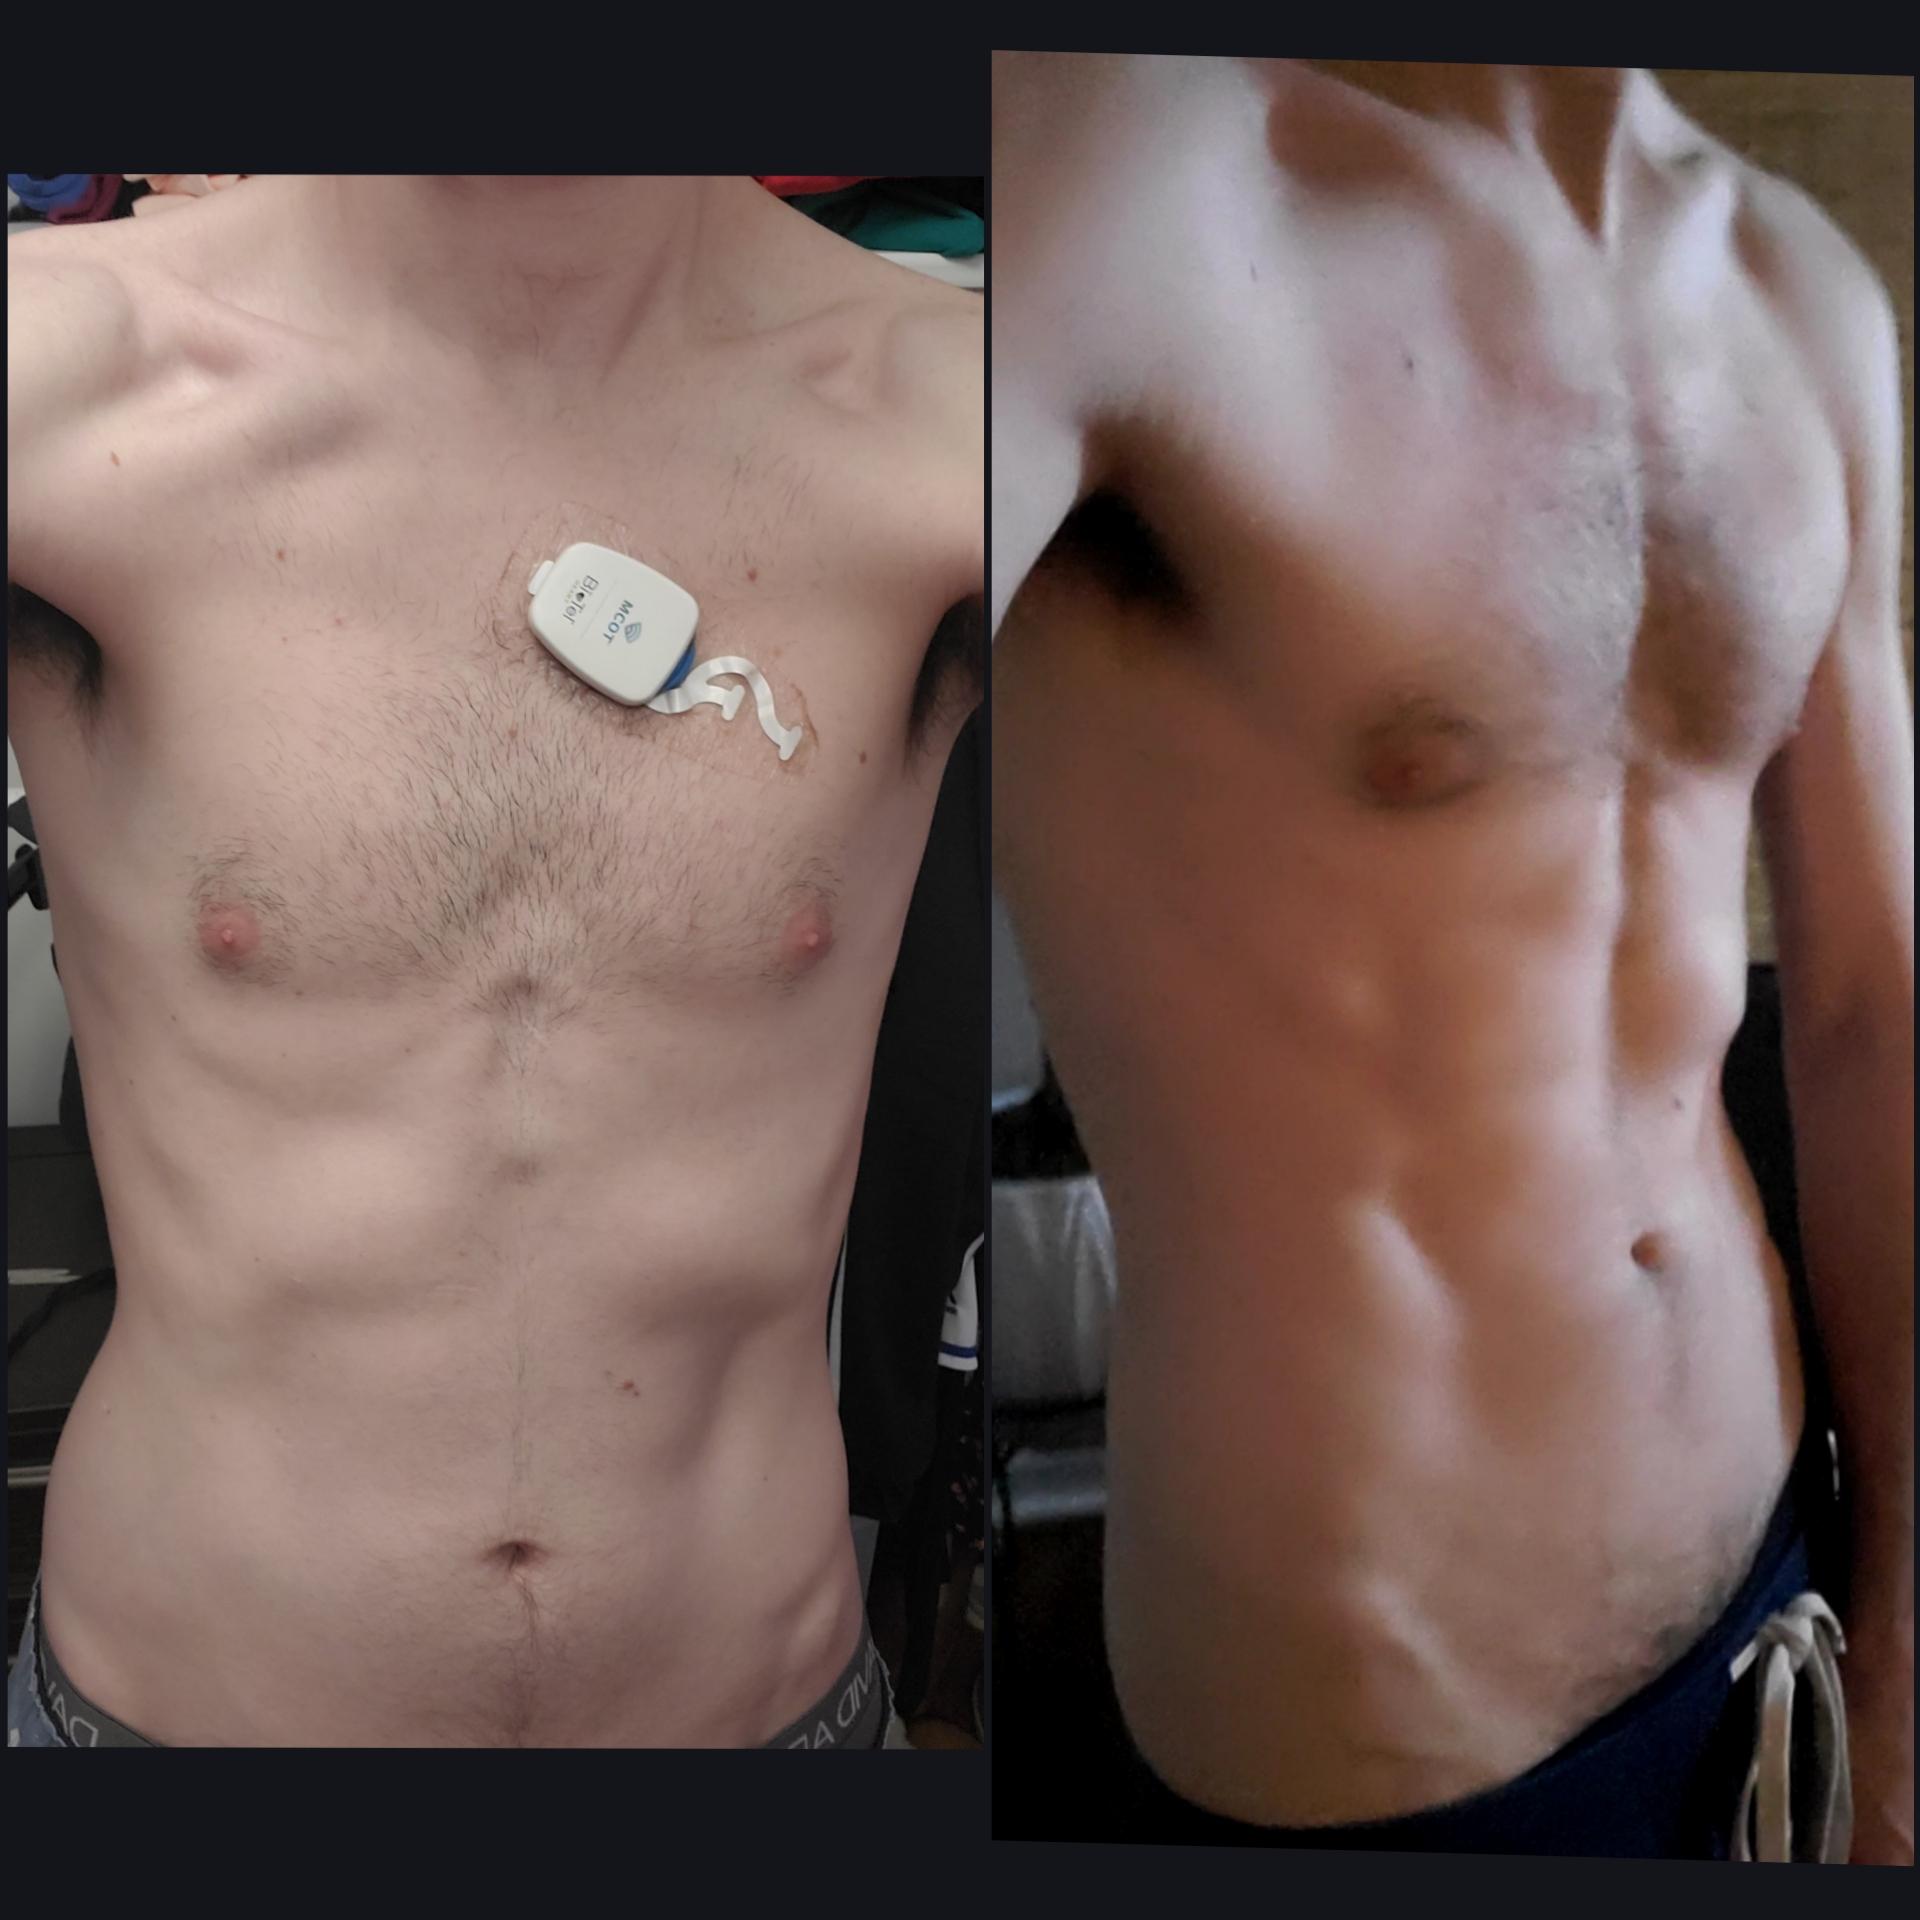 Progress Pics of 14 lbs Muscle Gain 6 foot Male 120 lbs to 134 lbs